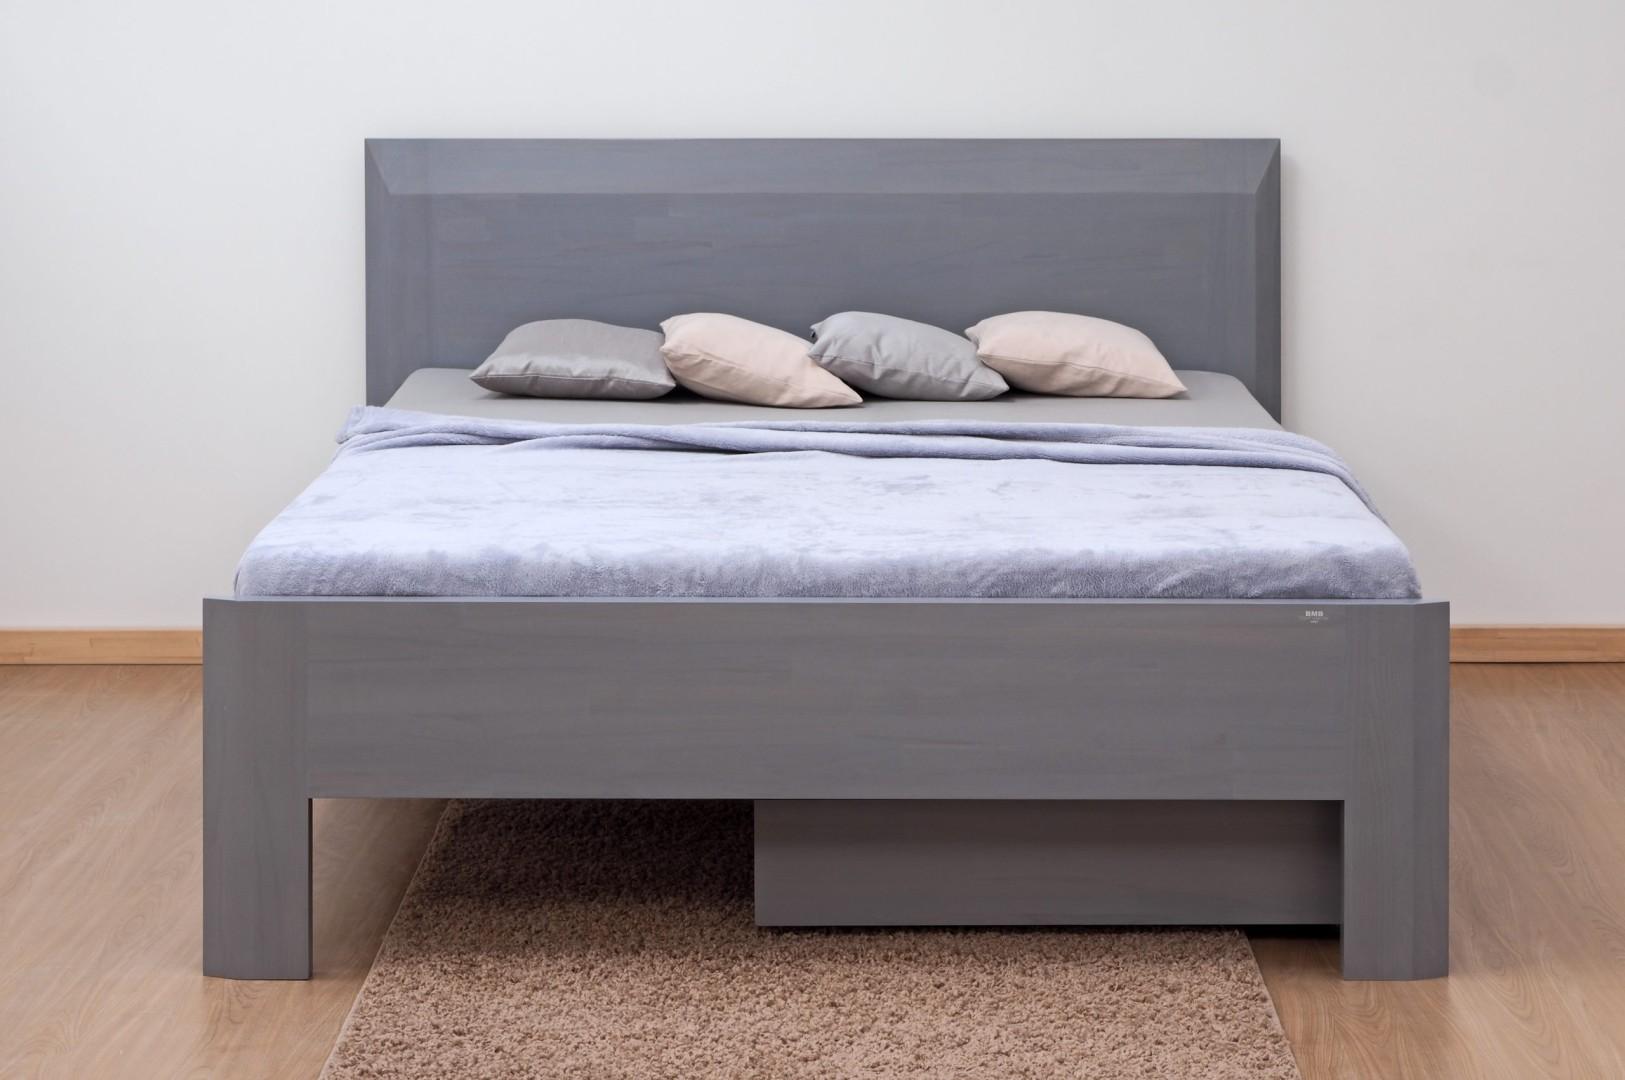 BMB ELLA FAMILY - masivní buková postel 160 x 210 cm, buk masiv